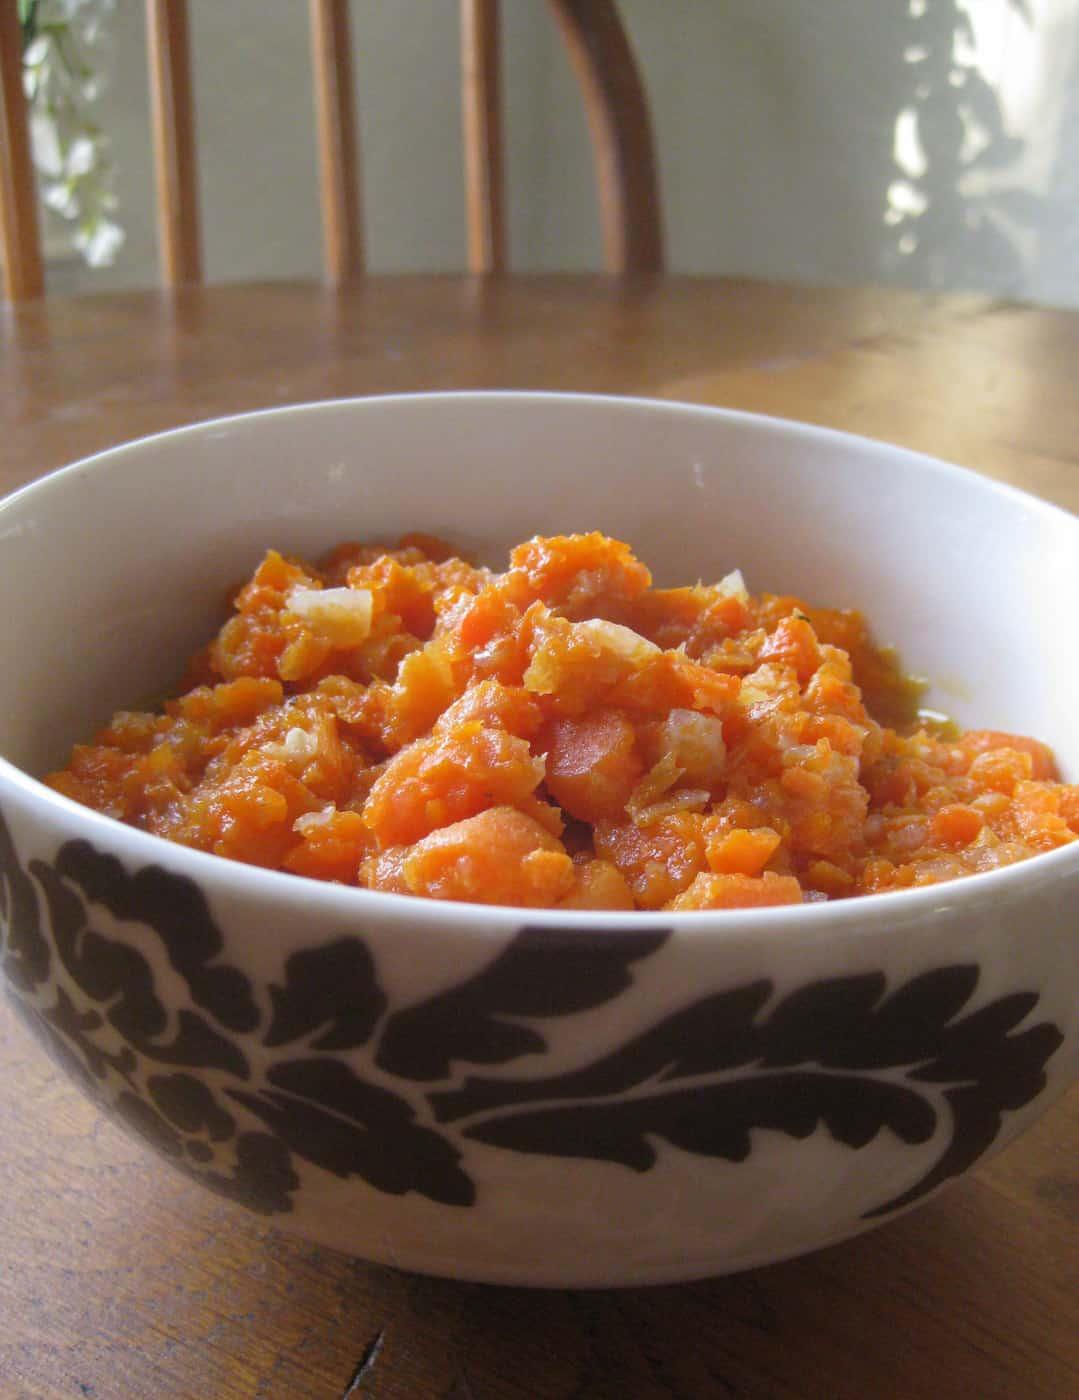 Chunky Carrot Soup